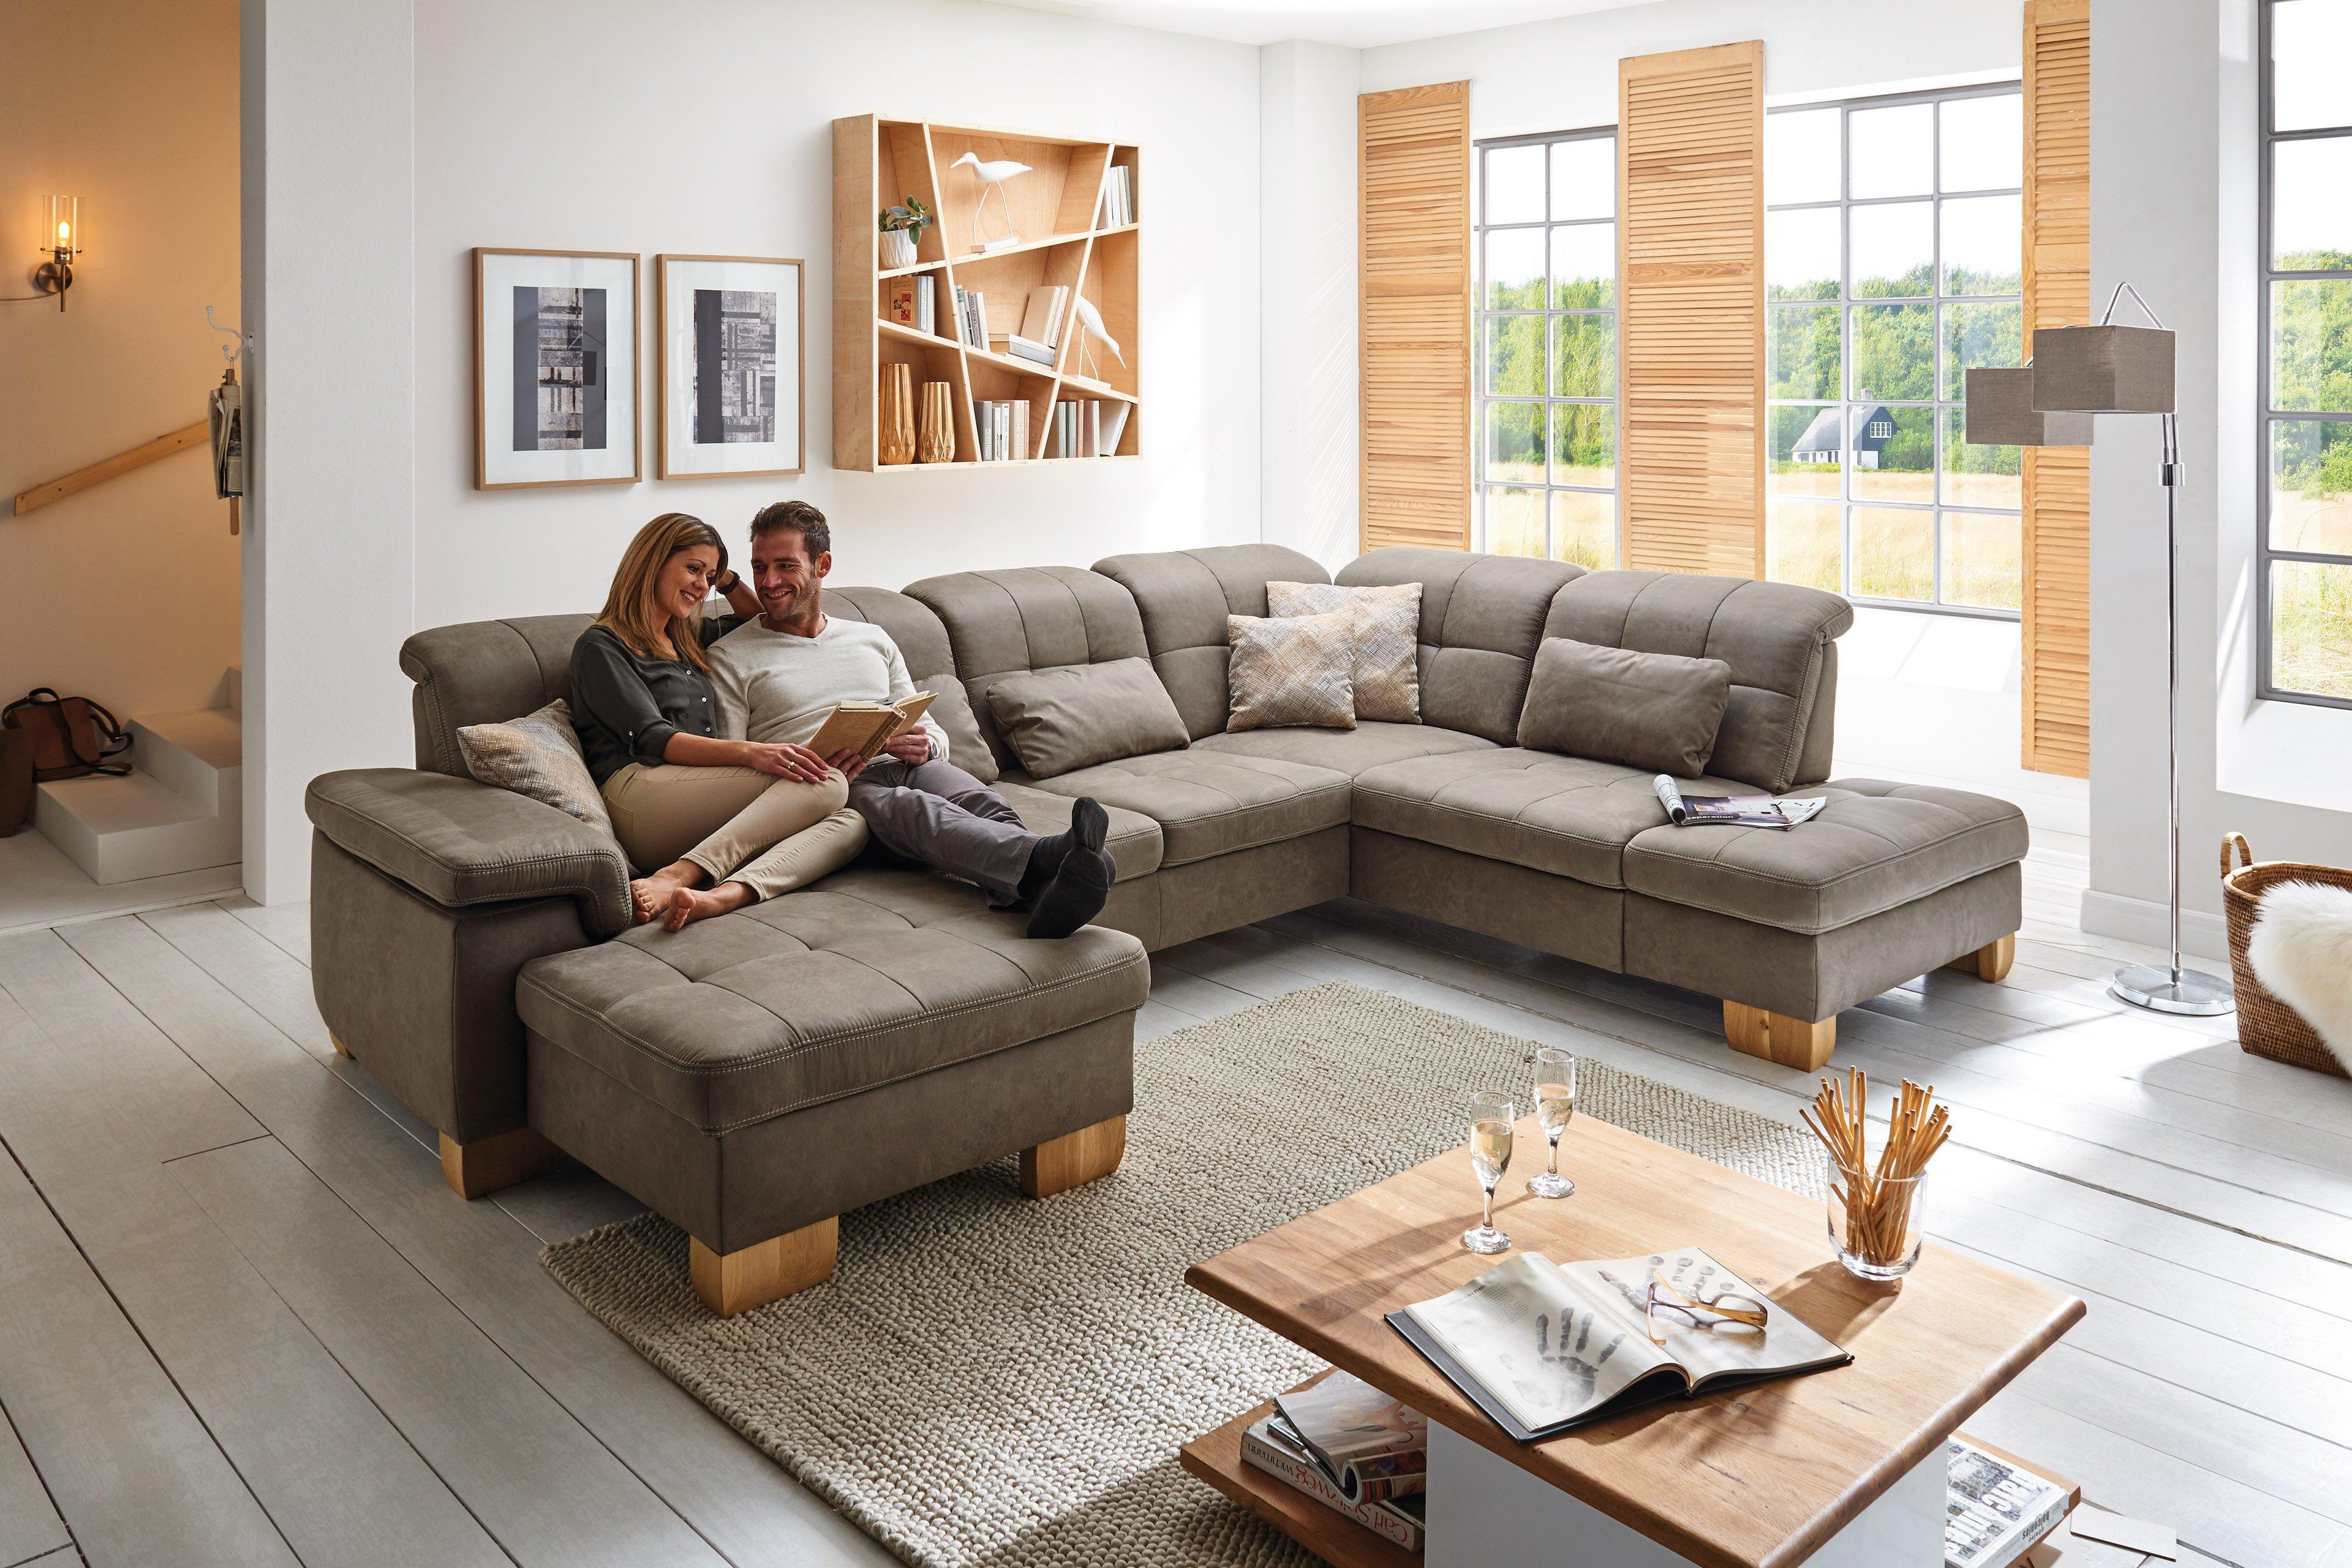 polipol sunny stacy polstergarnitur in grau braun. Black Bedroom Furniture Sets. Home Design Ideas